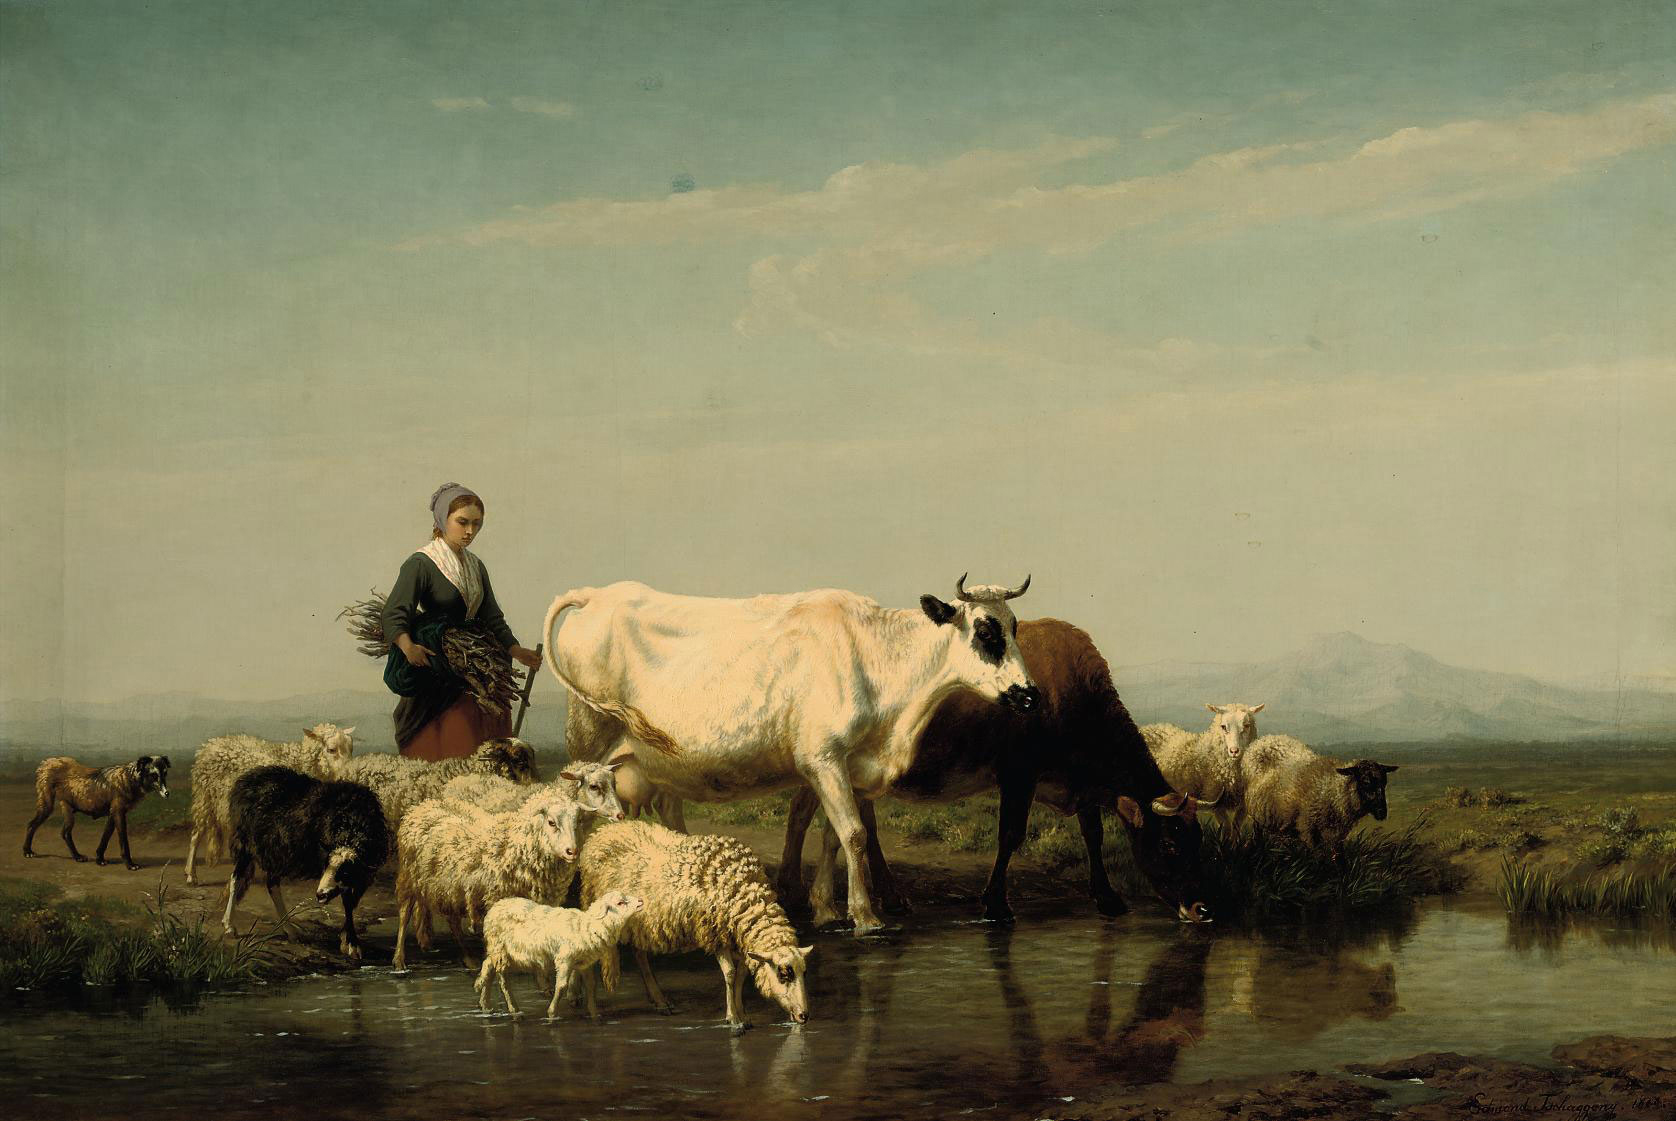 A herder watering her livestock